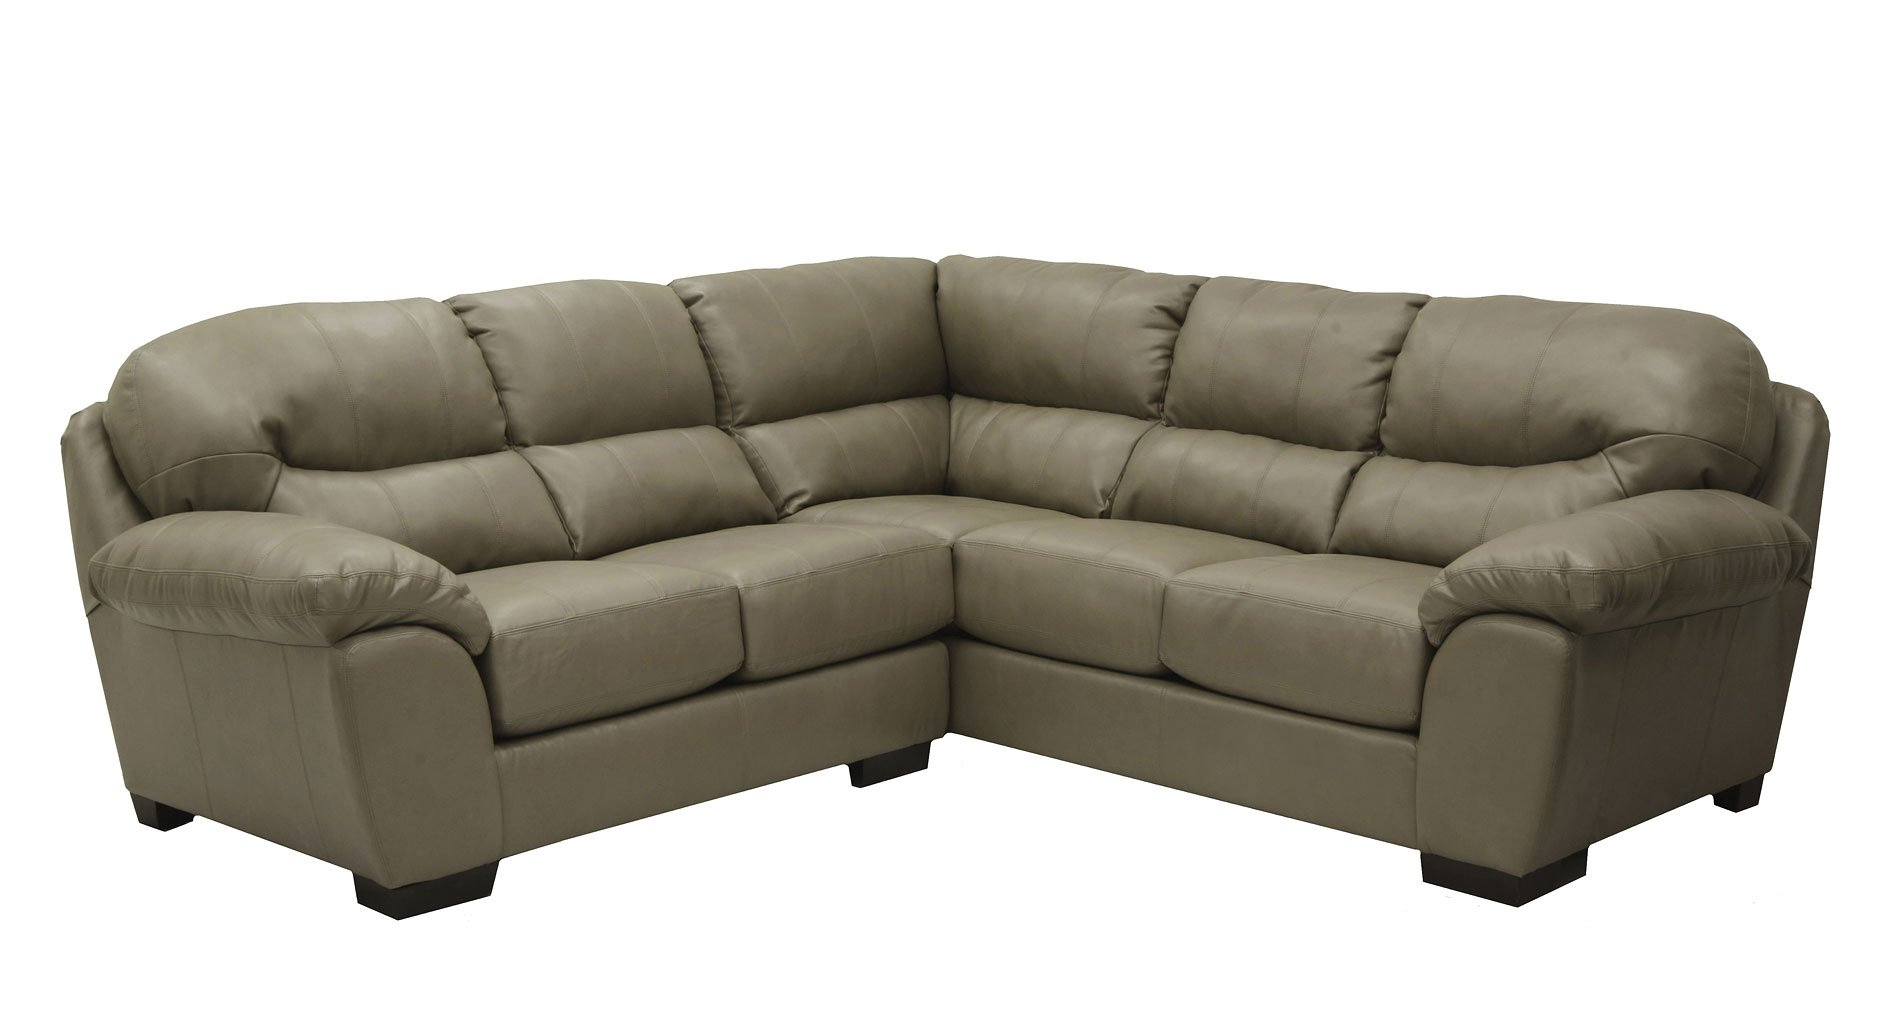 Lawson Modular Sectional (Putty) Jackson Furniture ...